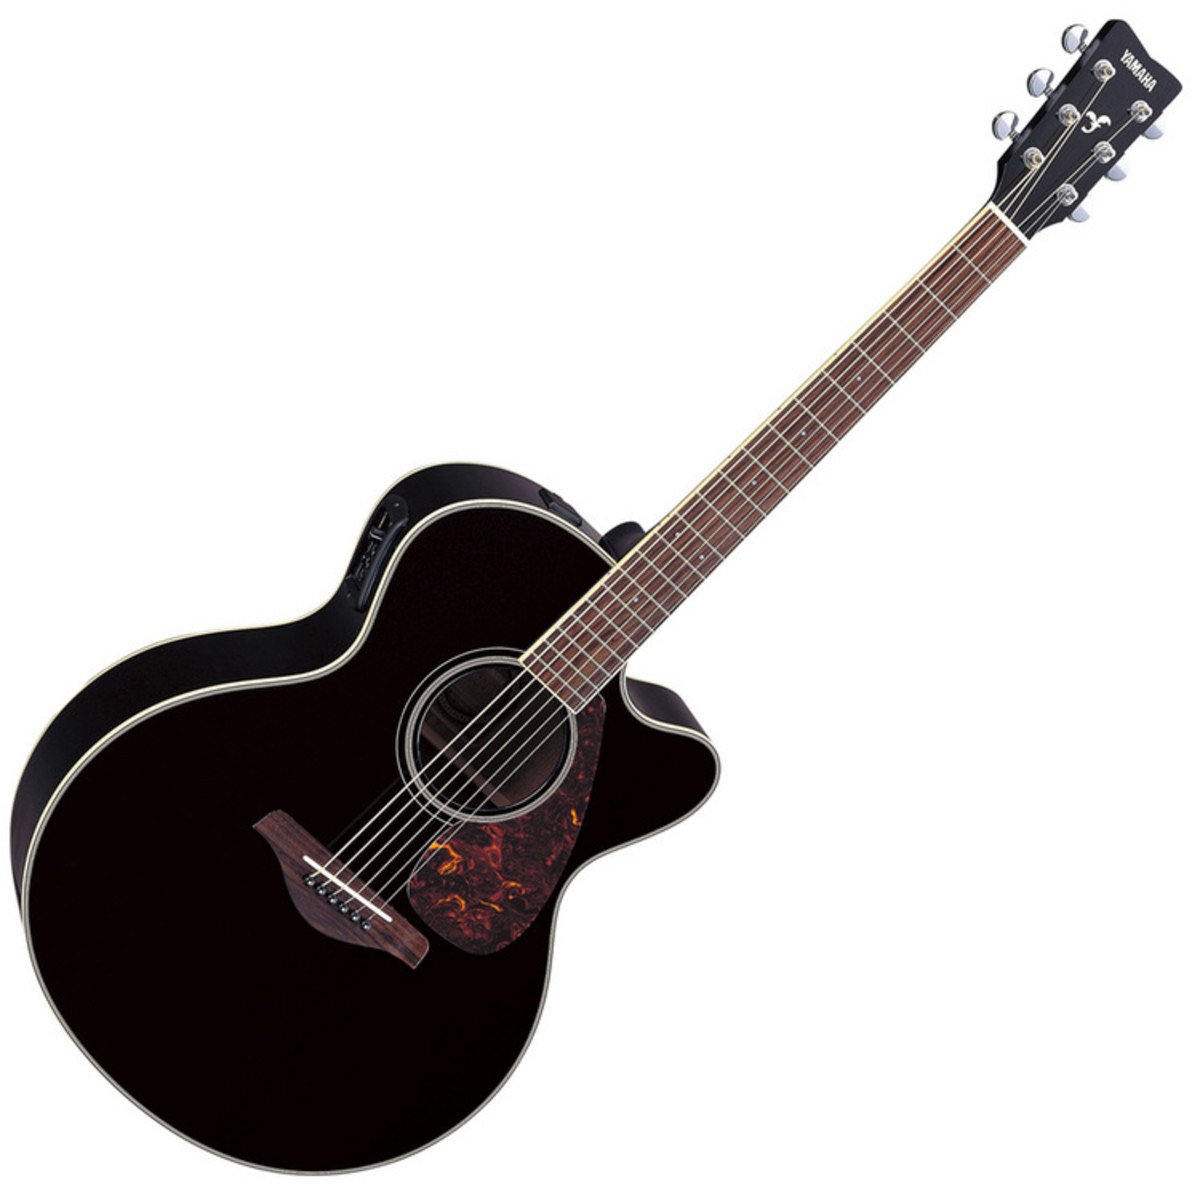 Yamaha fjx720sc electro acoustic guitar black at for Acoustic yamaha guitar